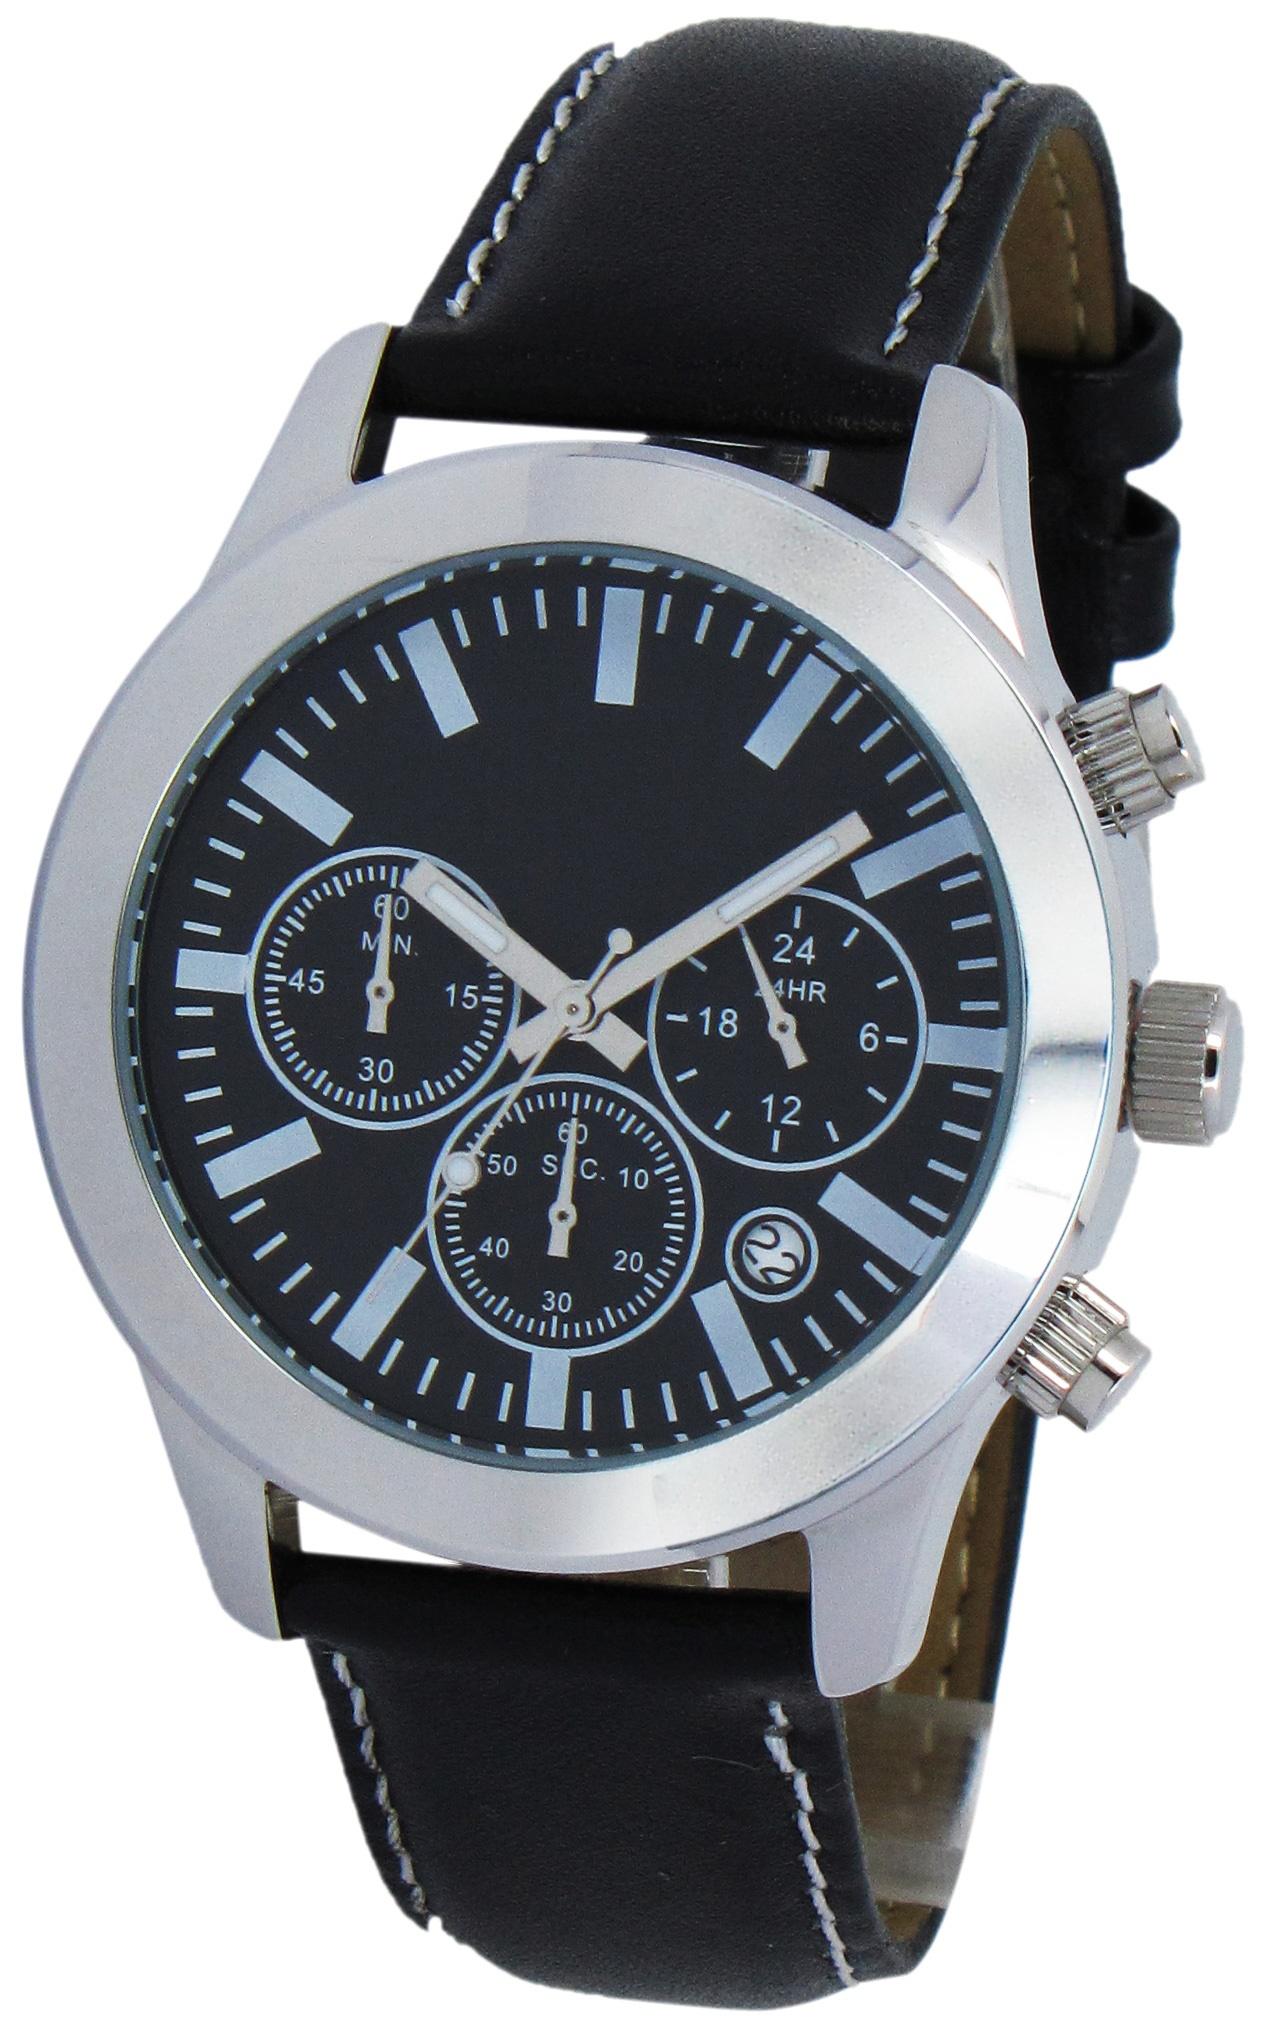 Chronograaf herenhorloge Hobart zwart